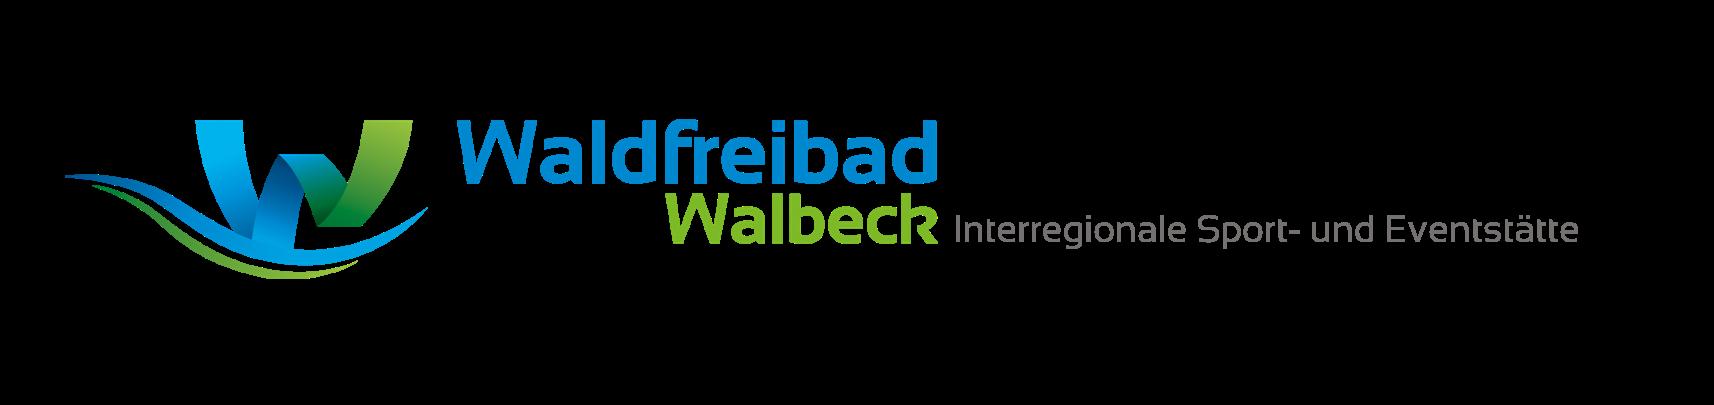 Waldfreibad Walbeck